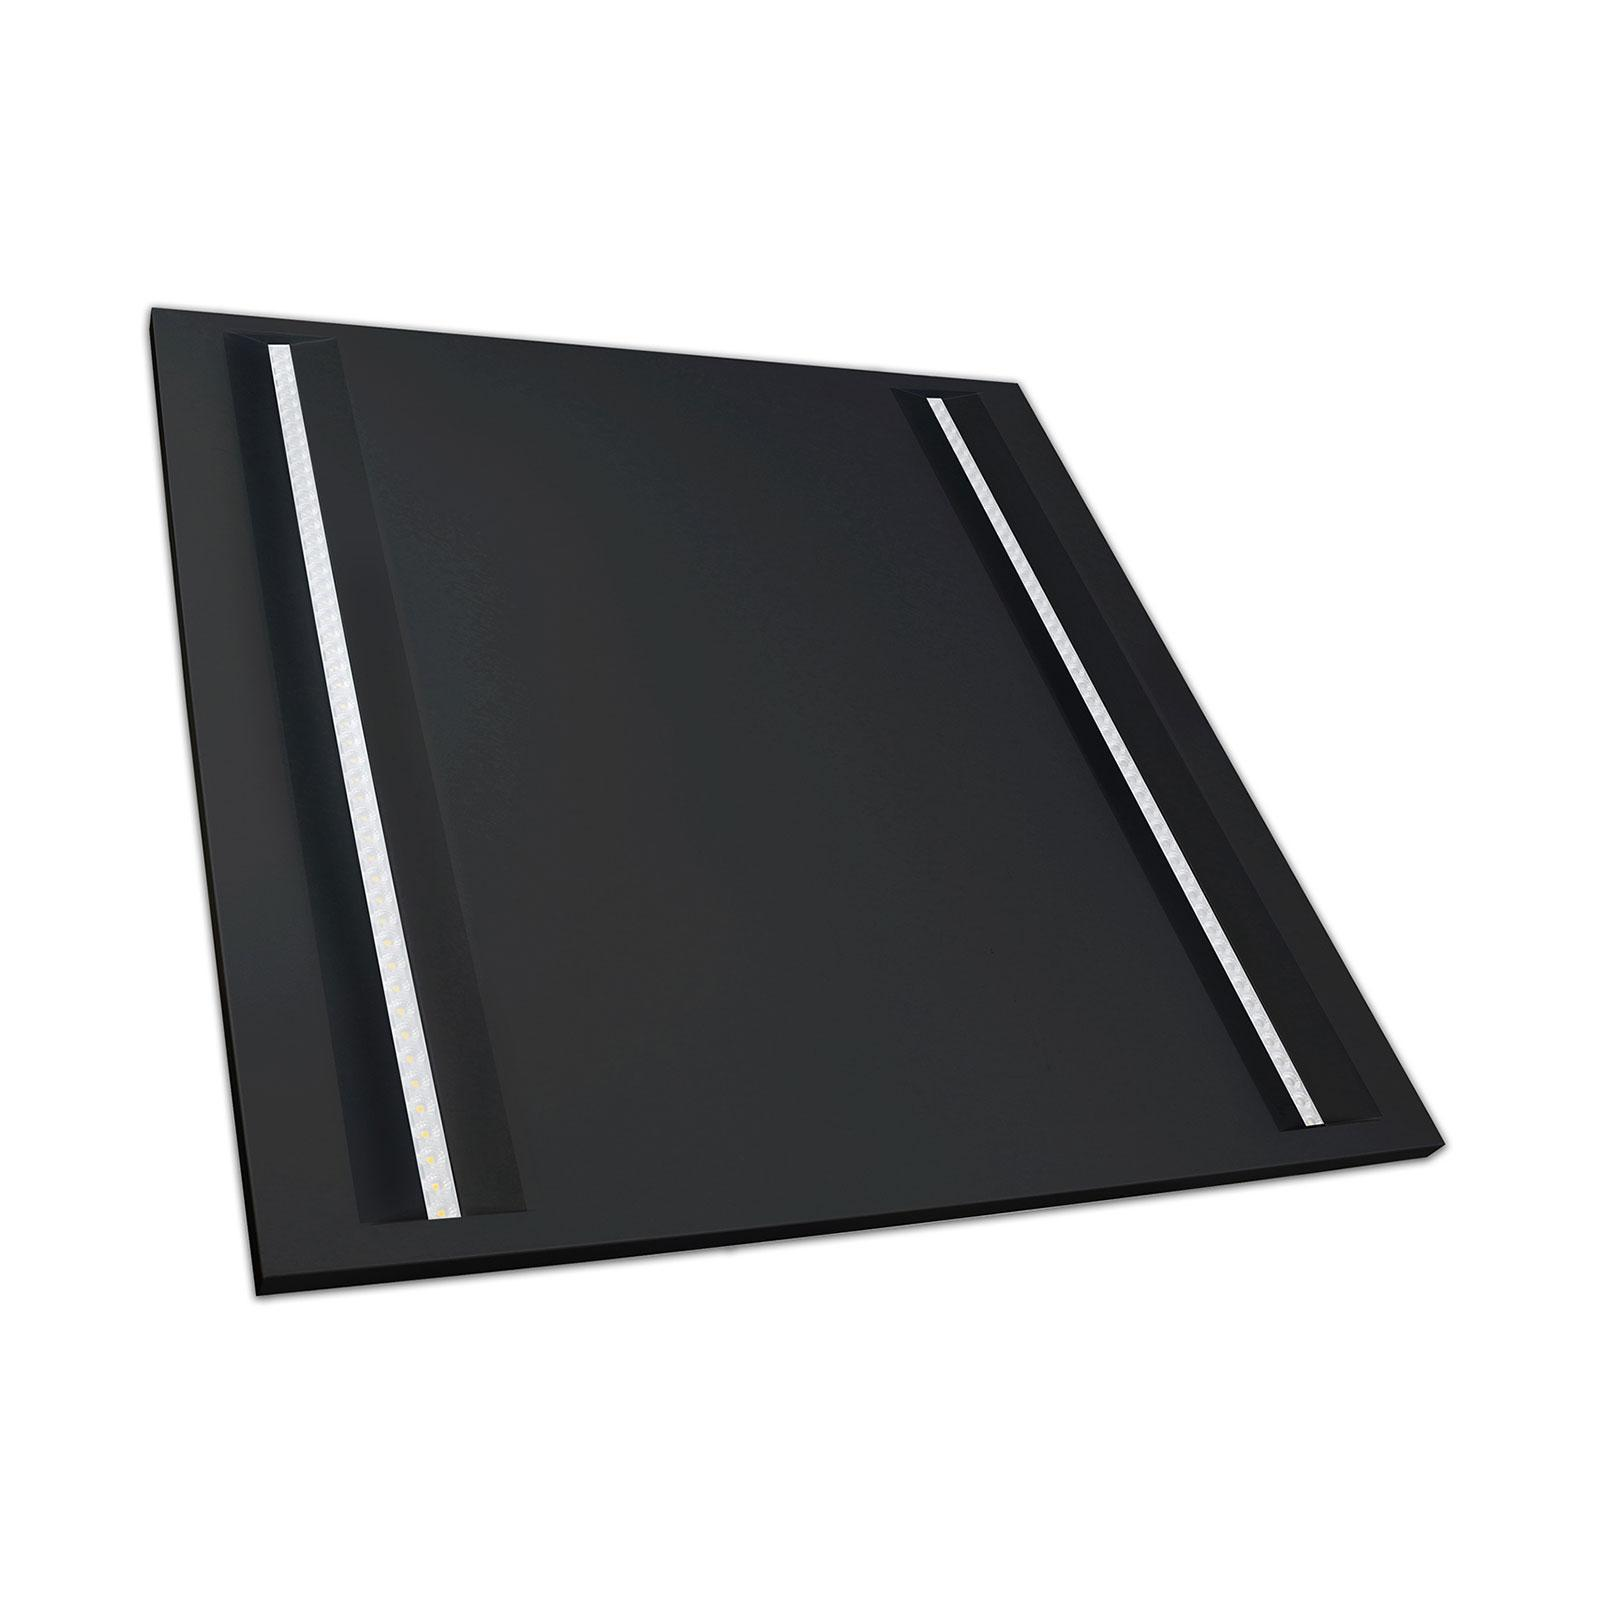 SPECTRUM LED panel ALGINE LINE 44W 60x60cm 120LM/W UGR<16 IP20 Neutrální bílá 5 let záruka černý